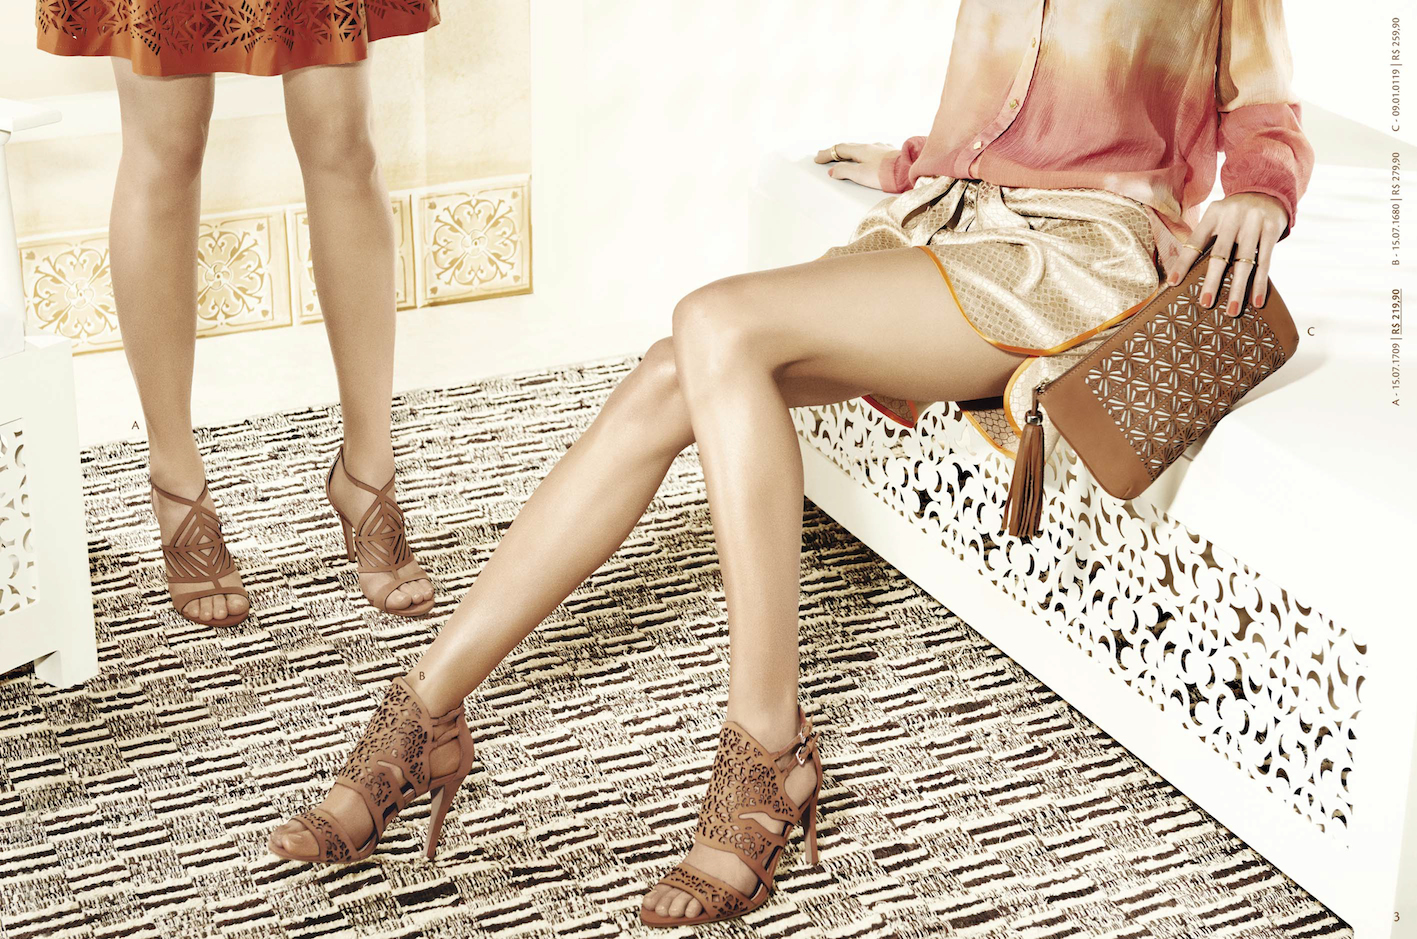 Catalogo_shoes_VERAO_2014-3.jpg